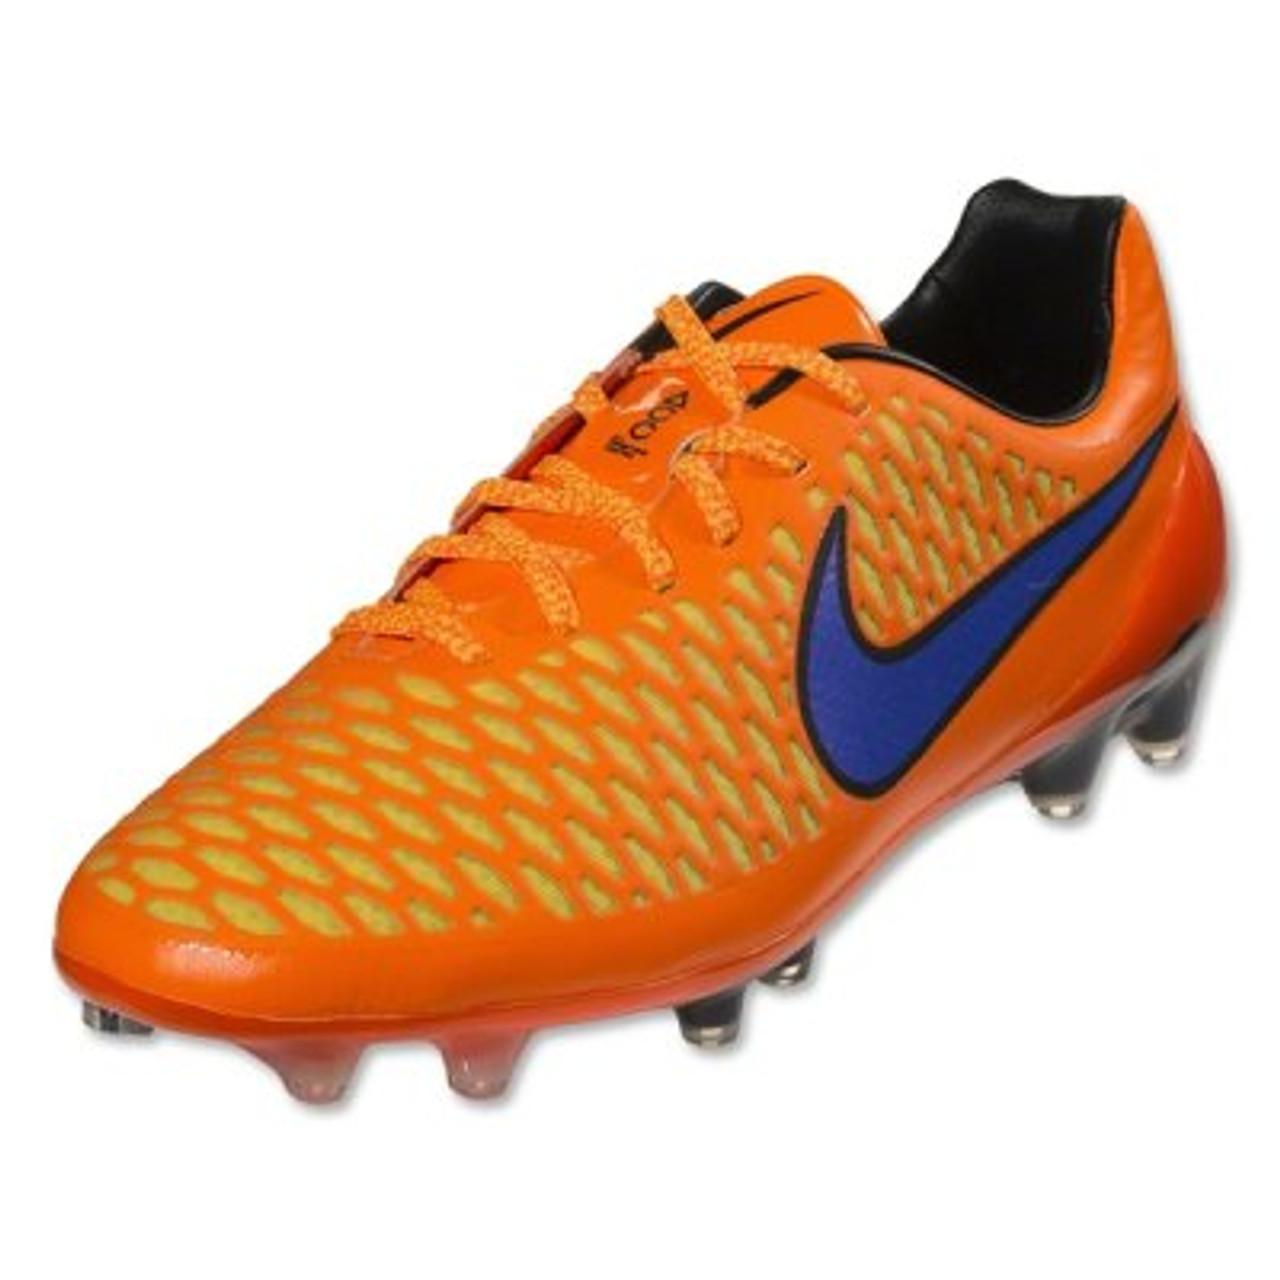 62b46a615 Nike Magista Opus FG - Total Orange Laser Orange Hyper Punch Persian Violet  SD (111617) - ohp soccer